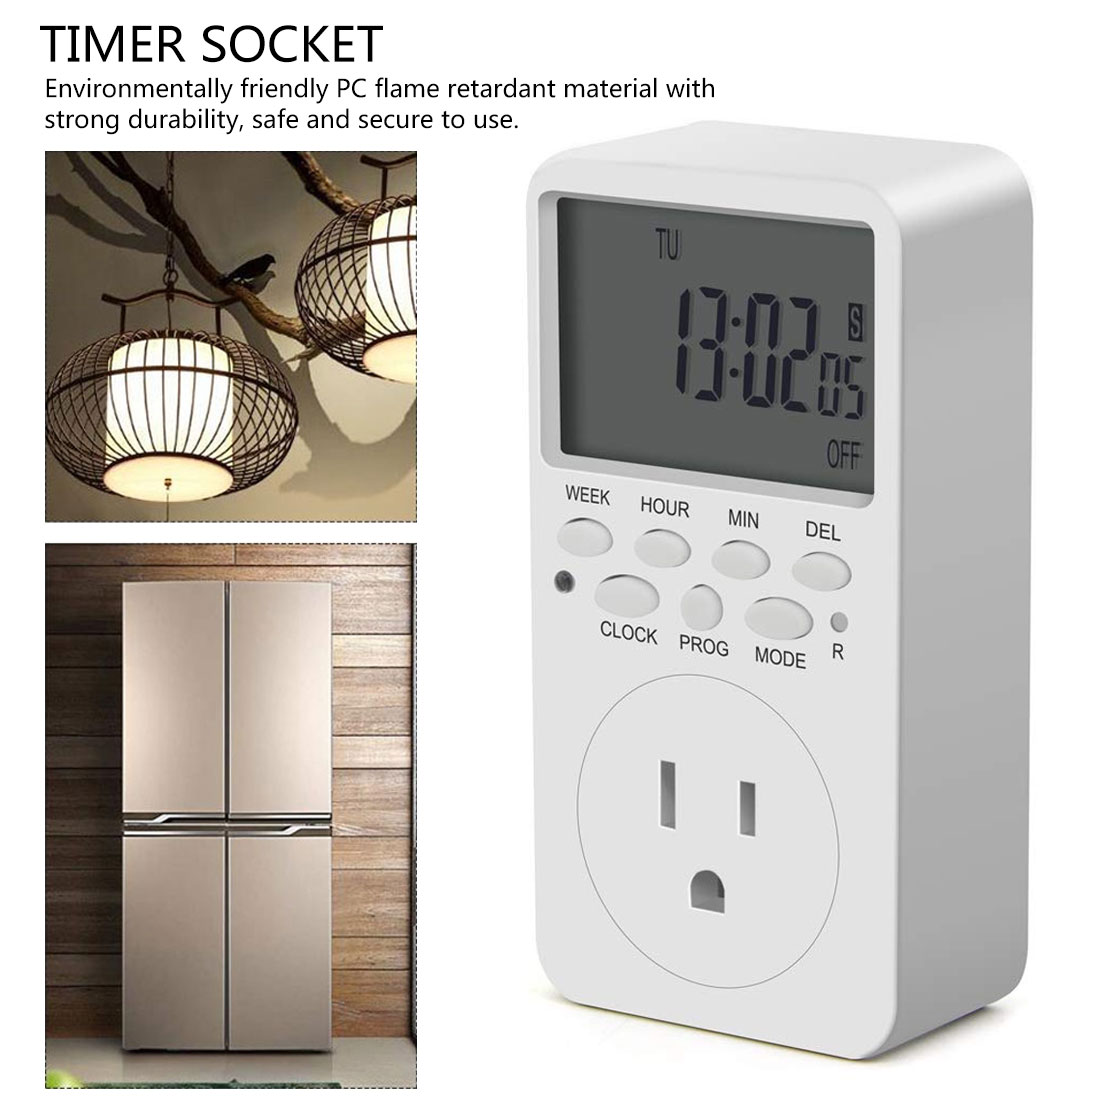 Interruptor cronómetro digital electrónico de 230 V, 120 V, 7 días, 12/24 horas, enchufe UE, Reino Unido, EE. UU., toma de corriente de temporizador programable para Cocina